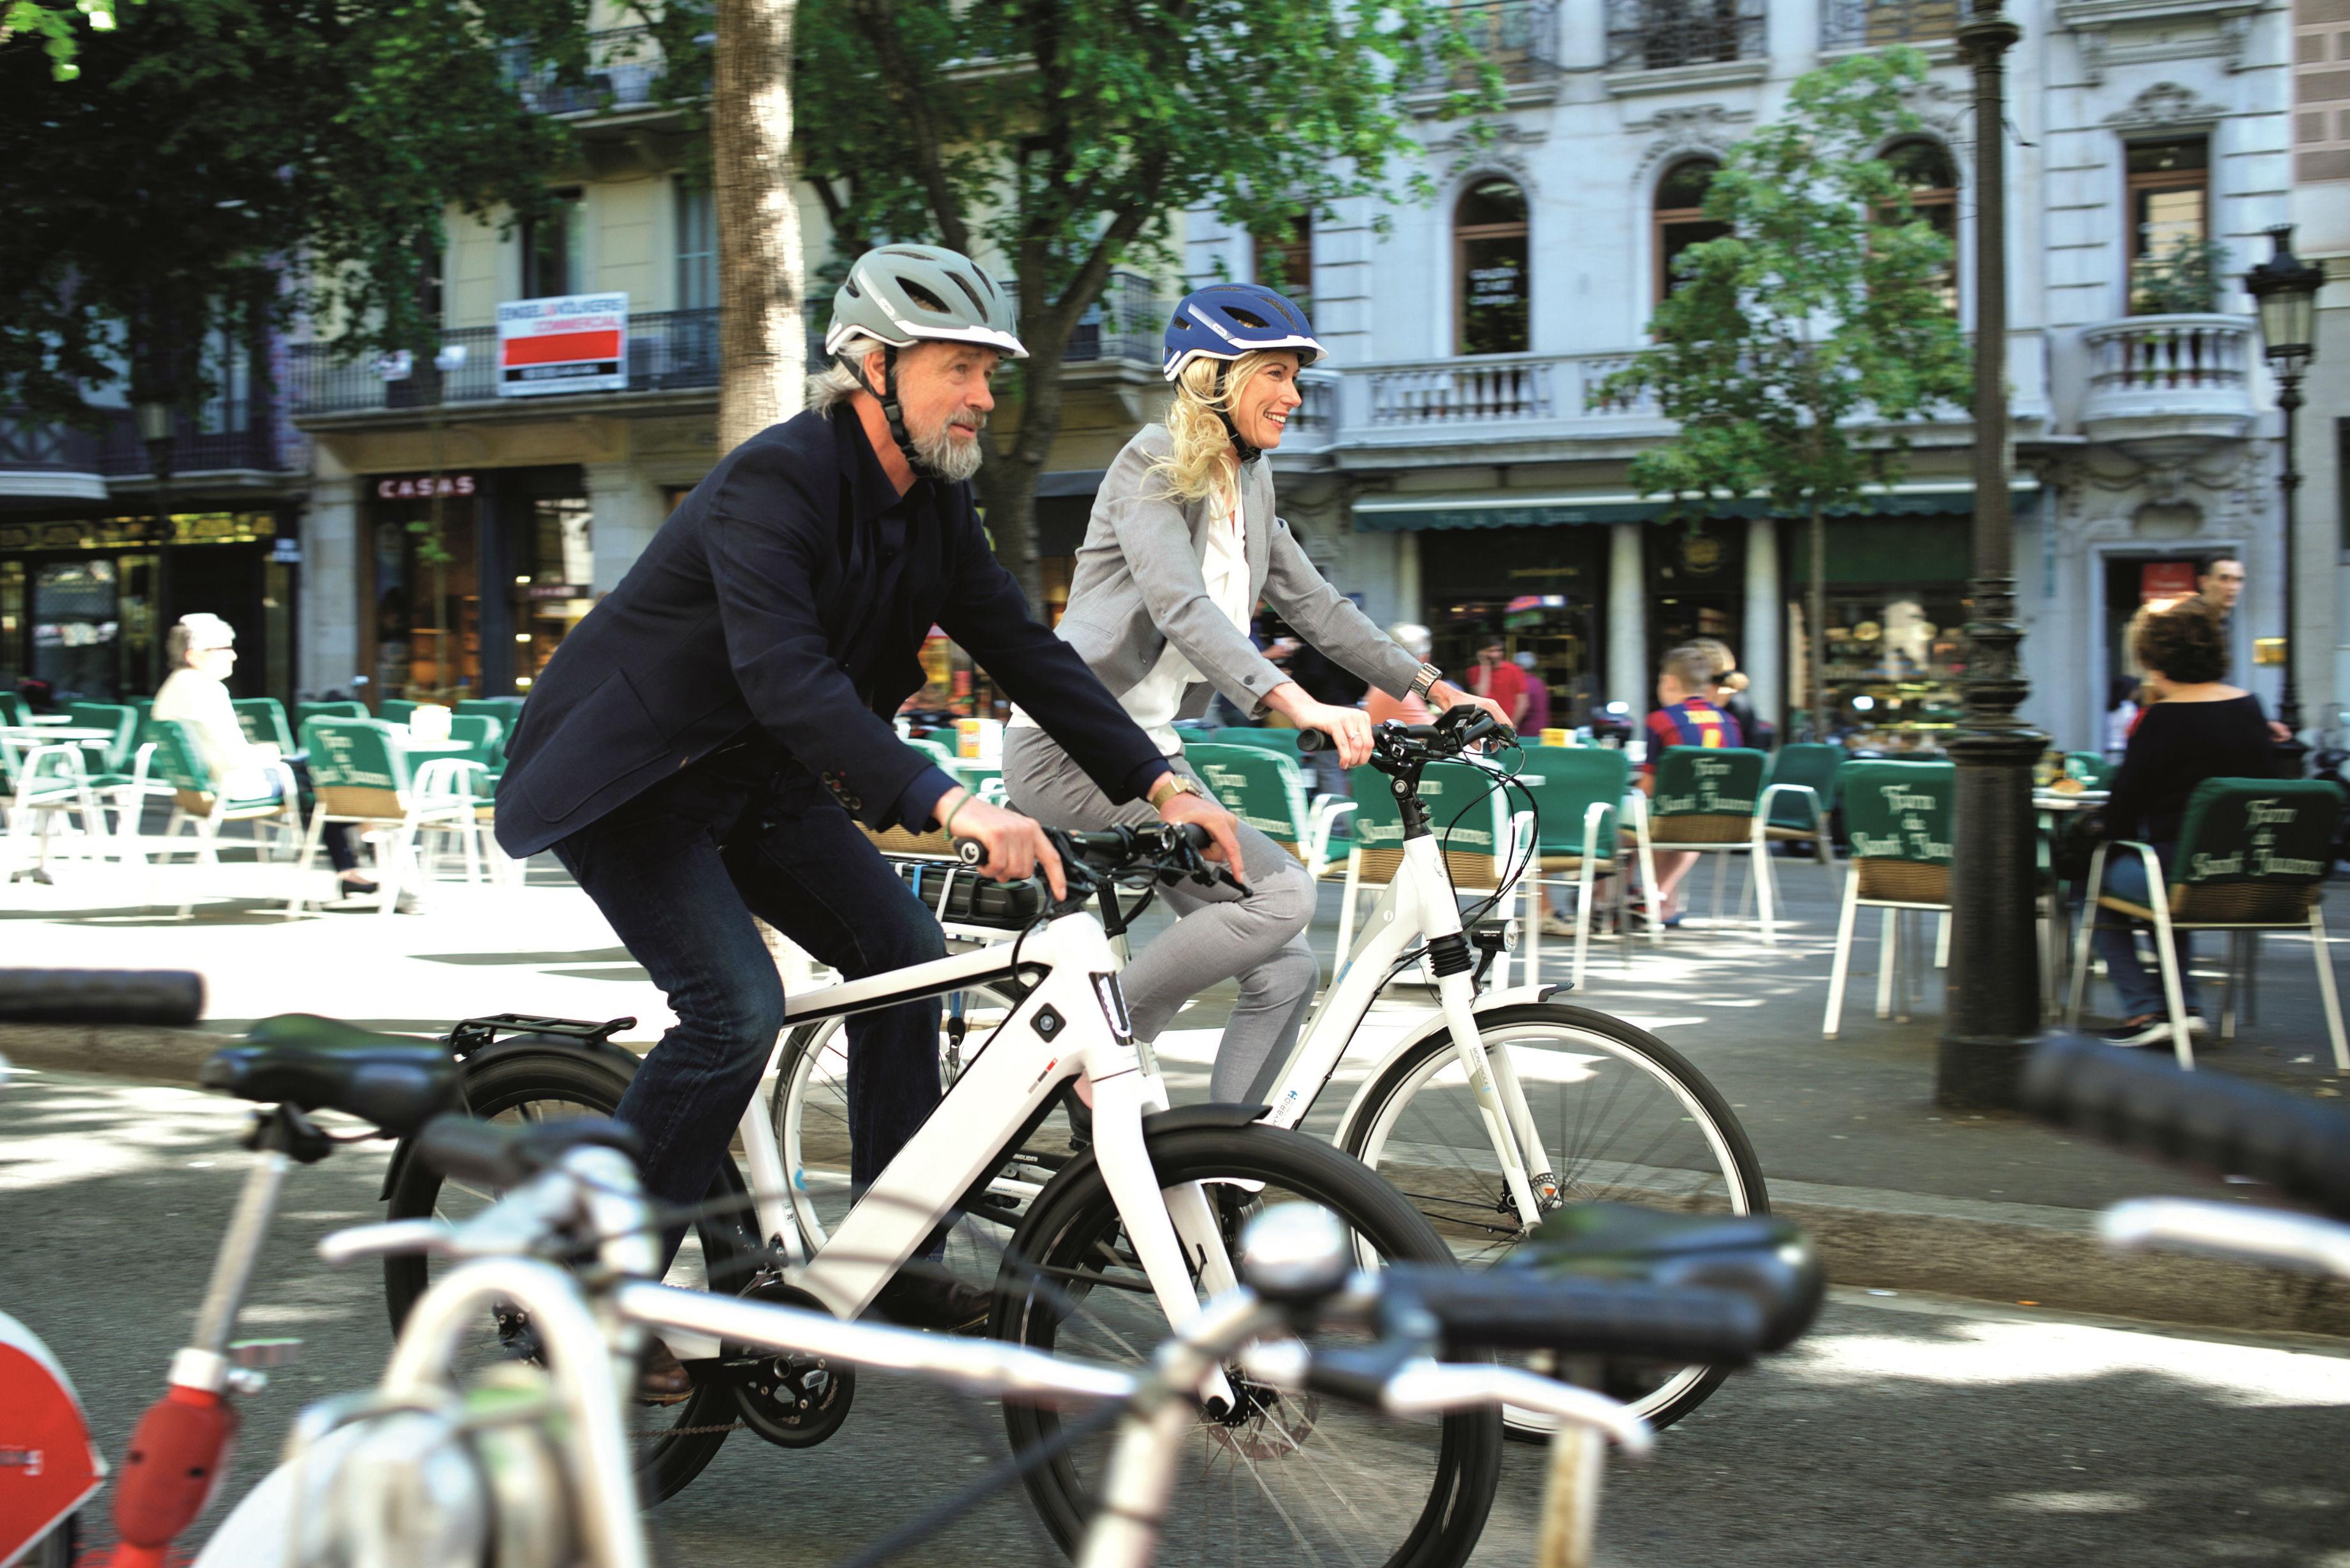 speed e bike helmets who is first bike europe. Black Bedroom Furniture Sets. Home Design Ideas